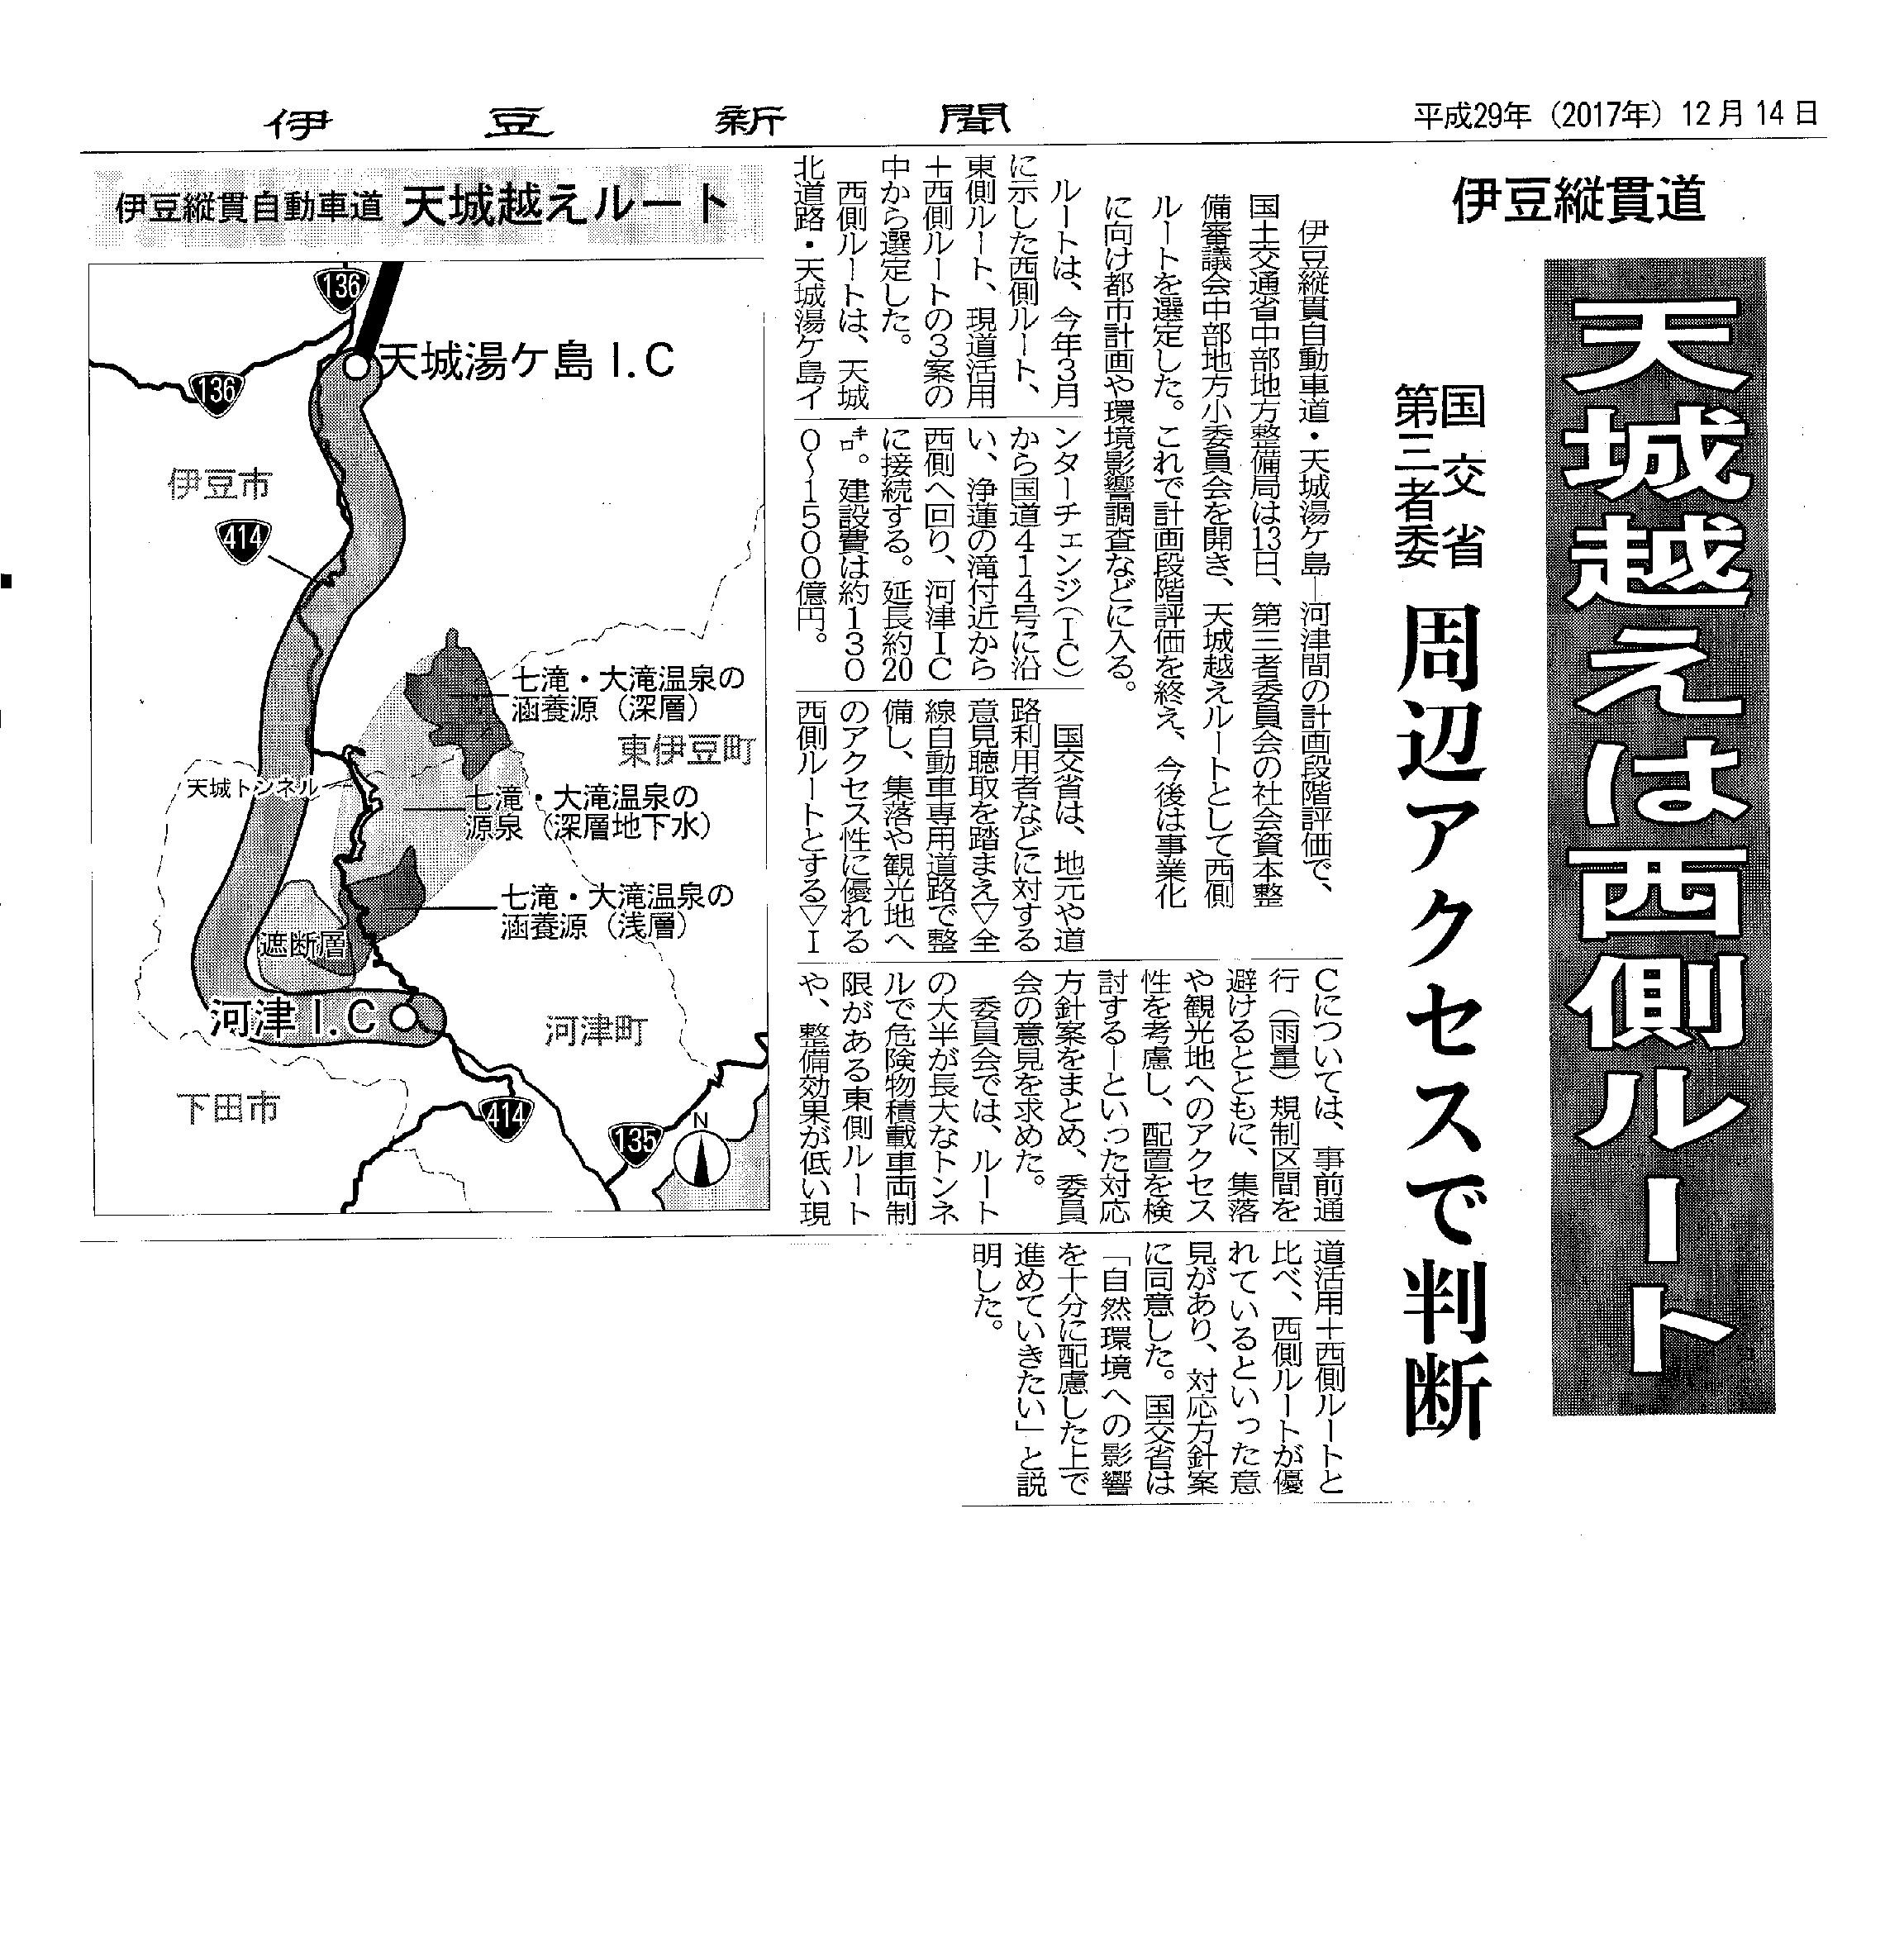 http://magaret.jp/mt_img/%E5%A4%A9%E5%9F%8E%E8%B7%AF.jpg